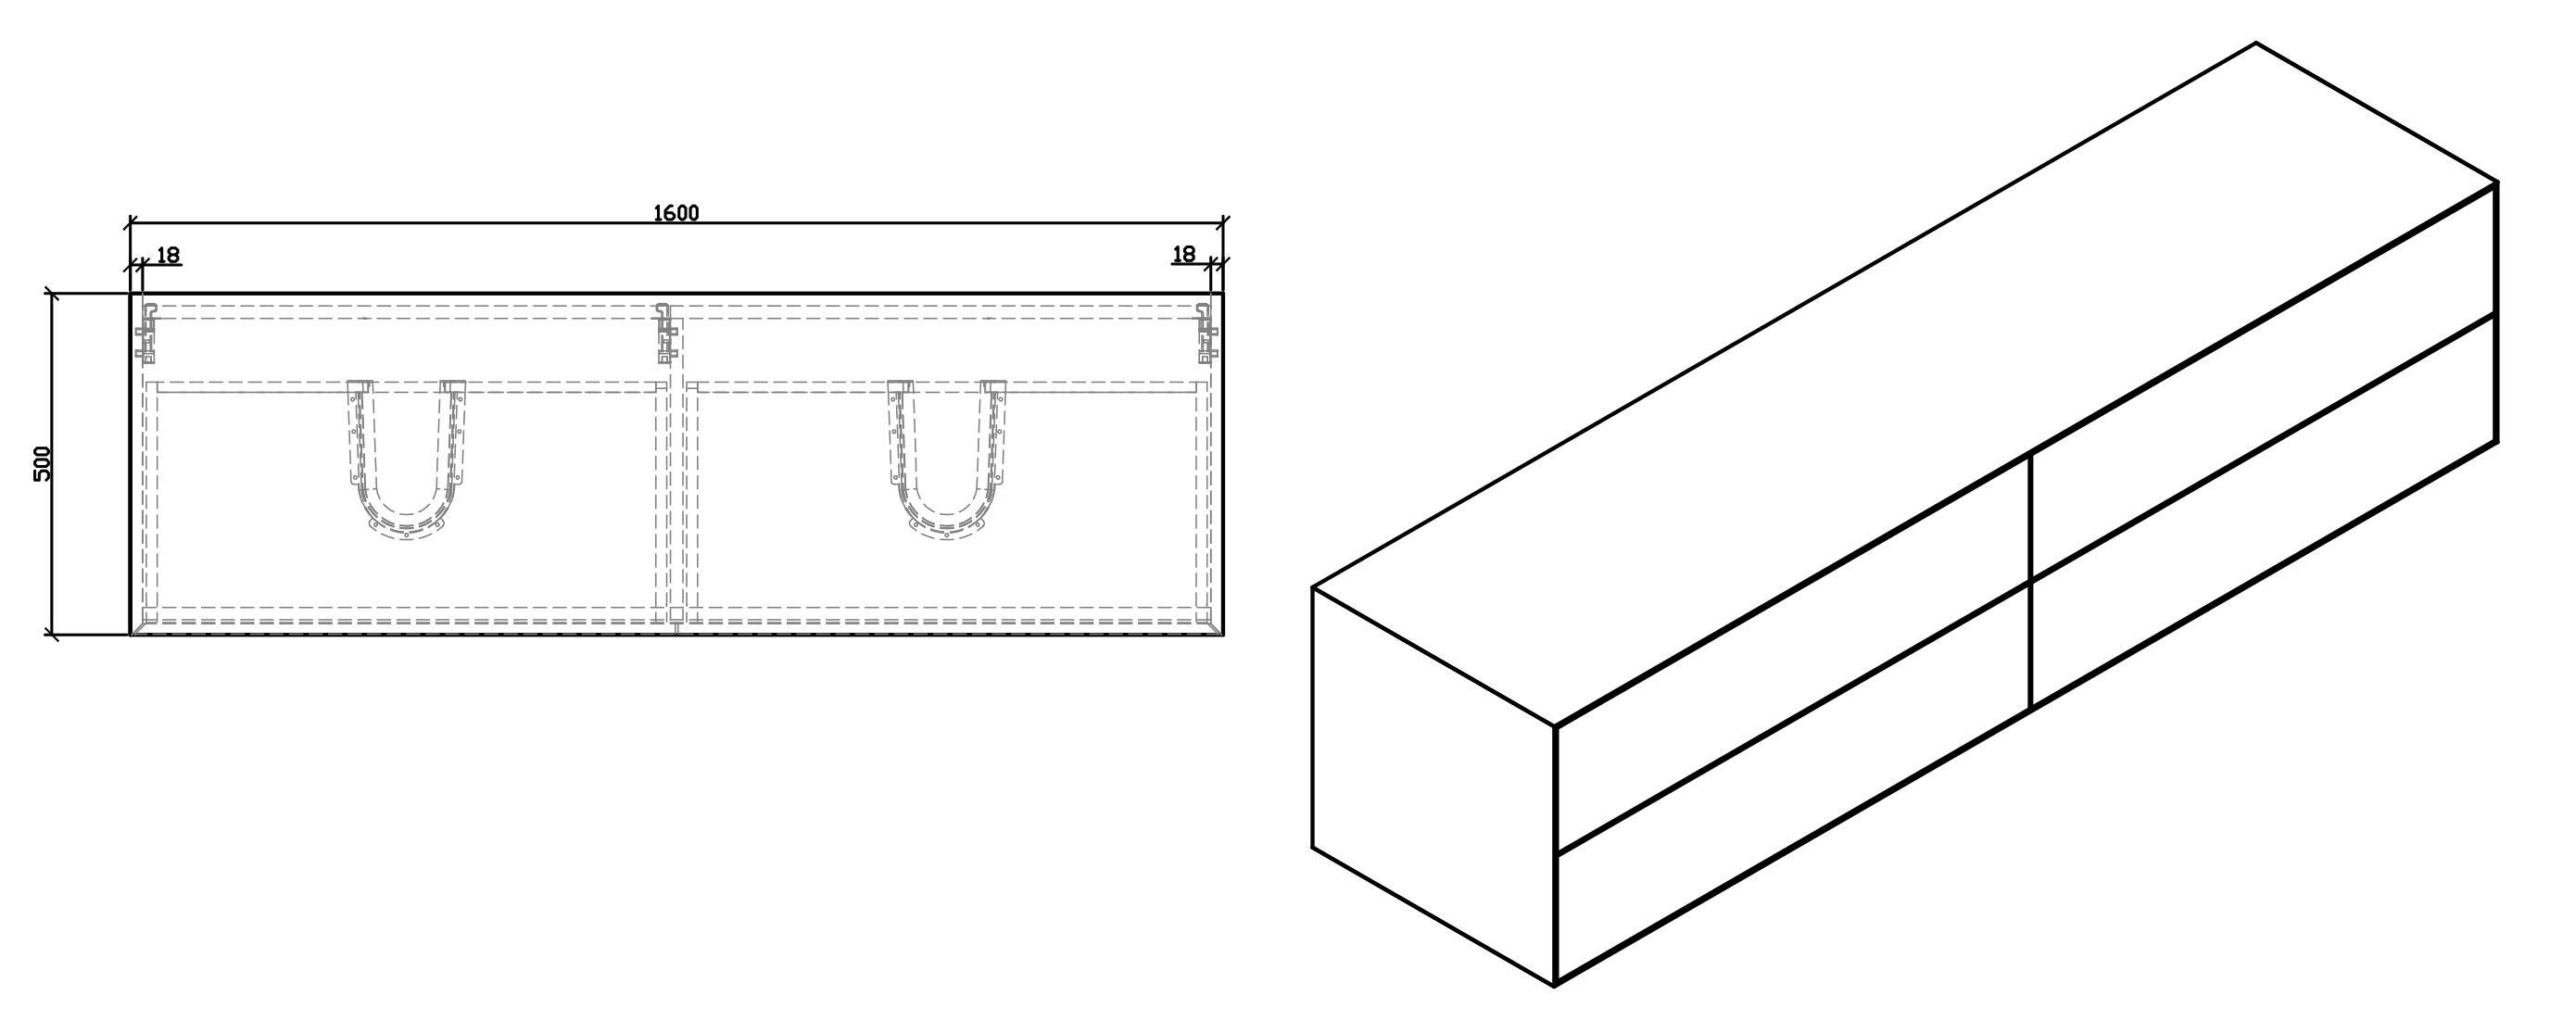 Bathroom furniture set Milou 1600 - Drawing 2